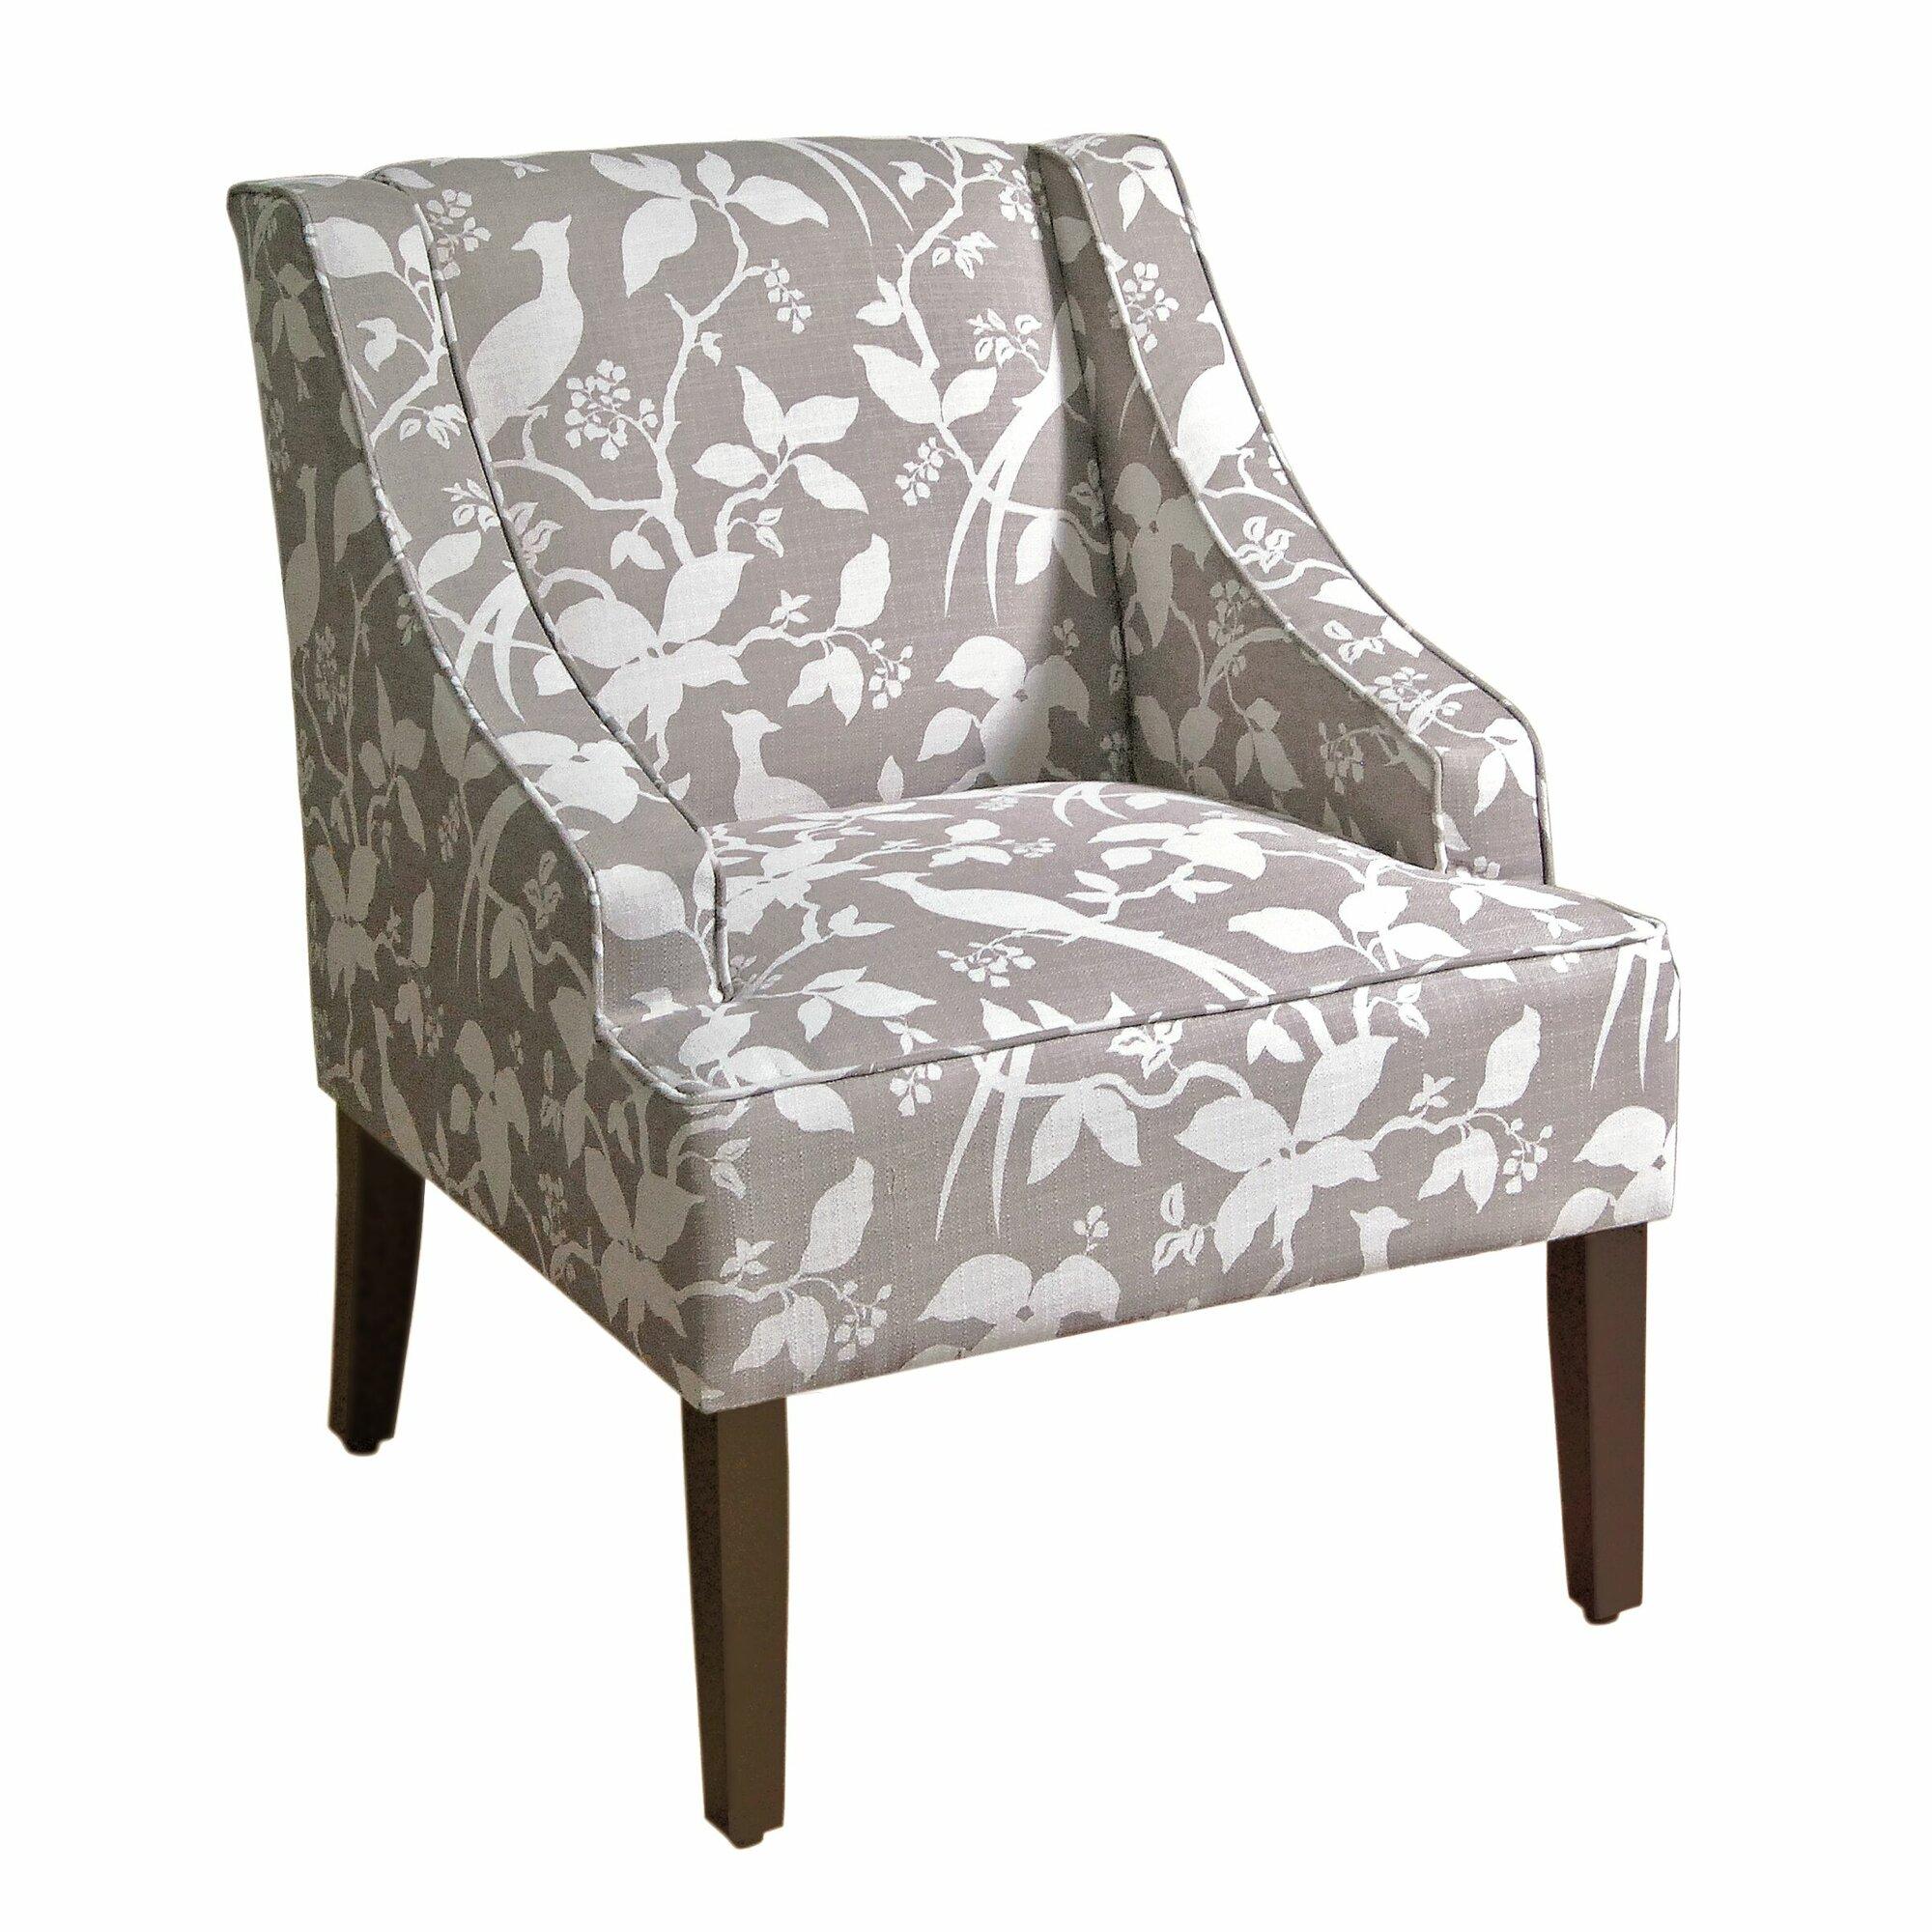 Laurel foundry modern farmhouse annette accent armchair - Laurel foundry modern farmhouse bedroom ...